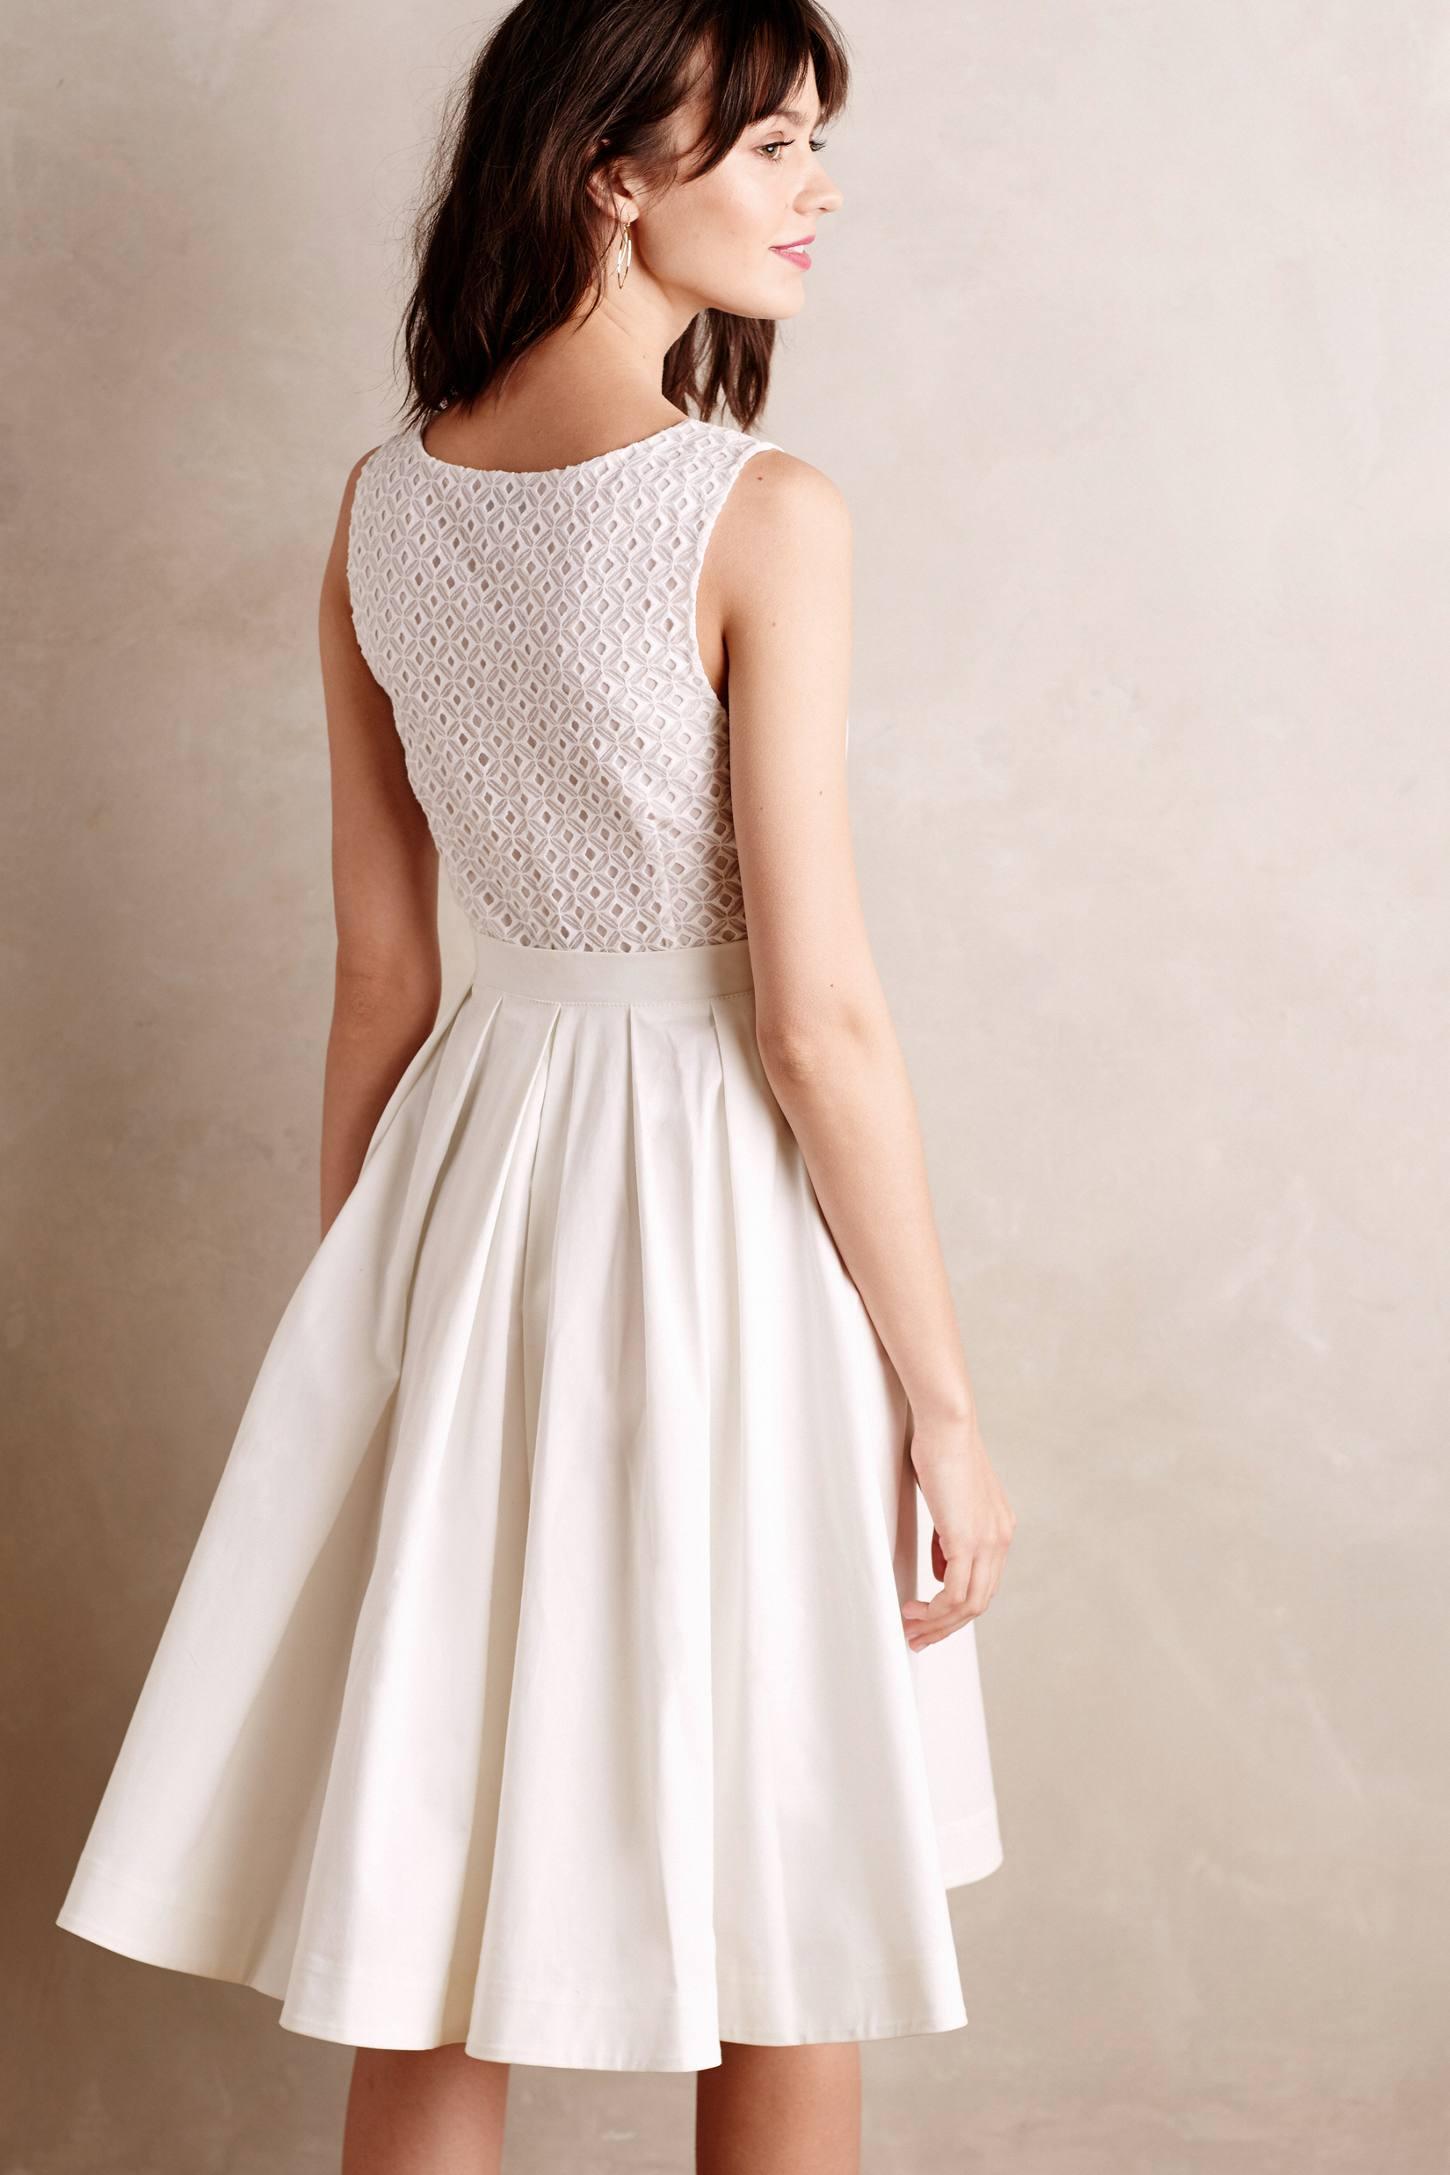 Collette dinnigan Pleated Trellis Dress in White | Lyst